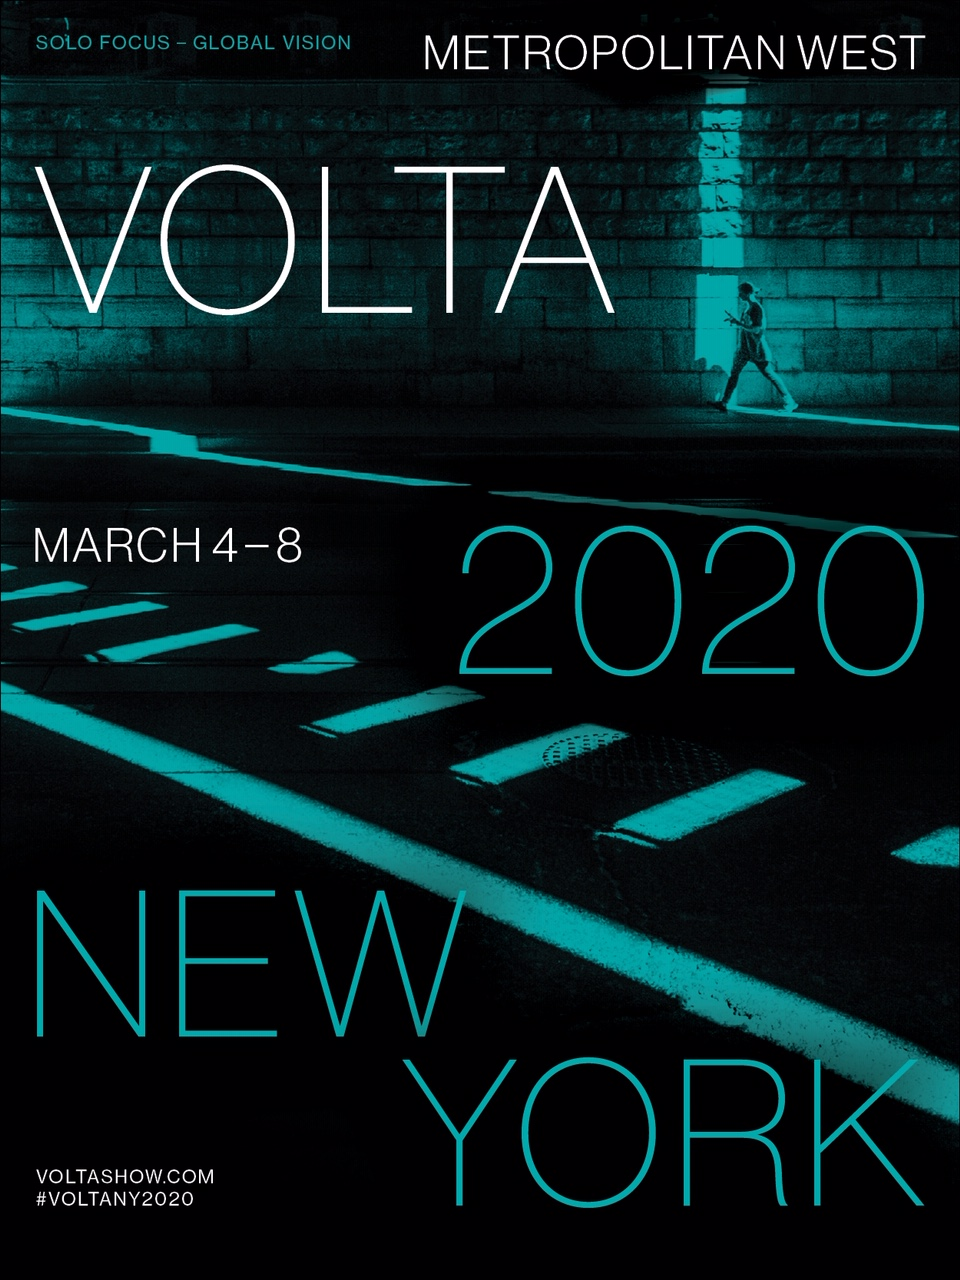 VOLTA New York